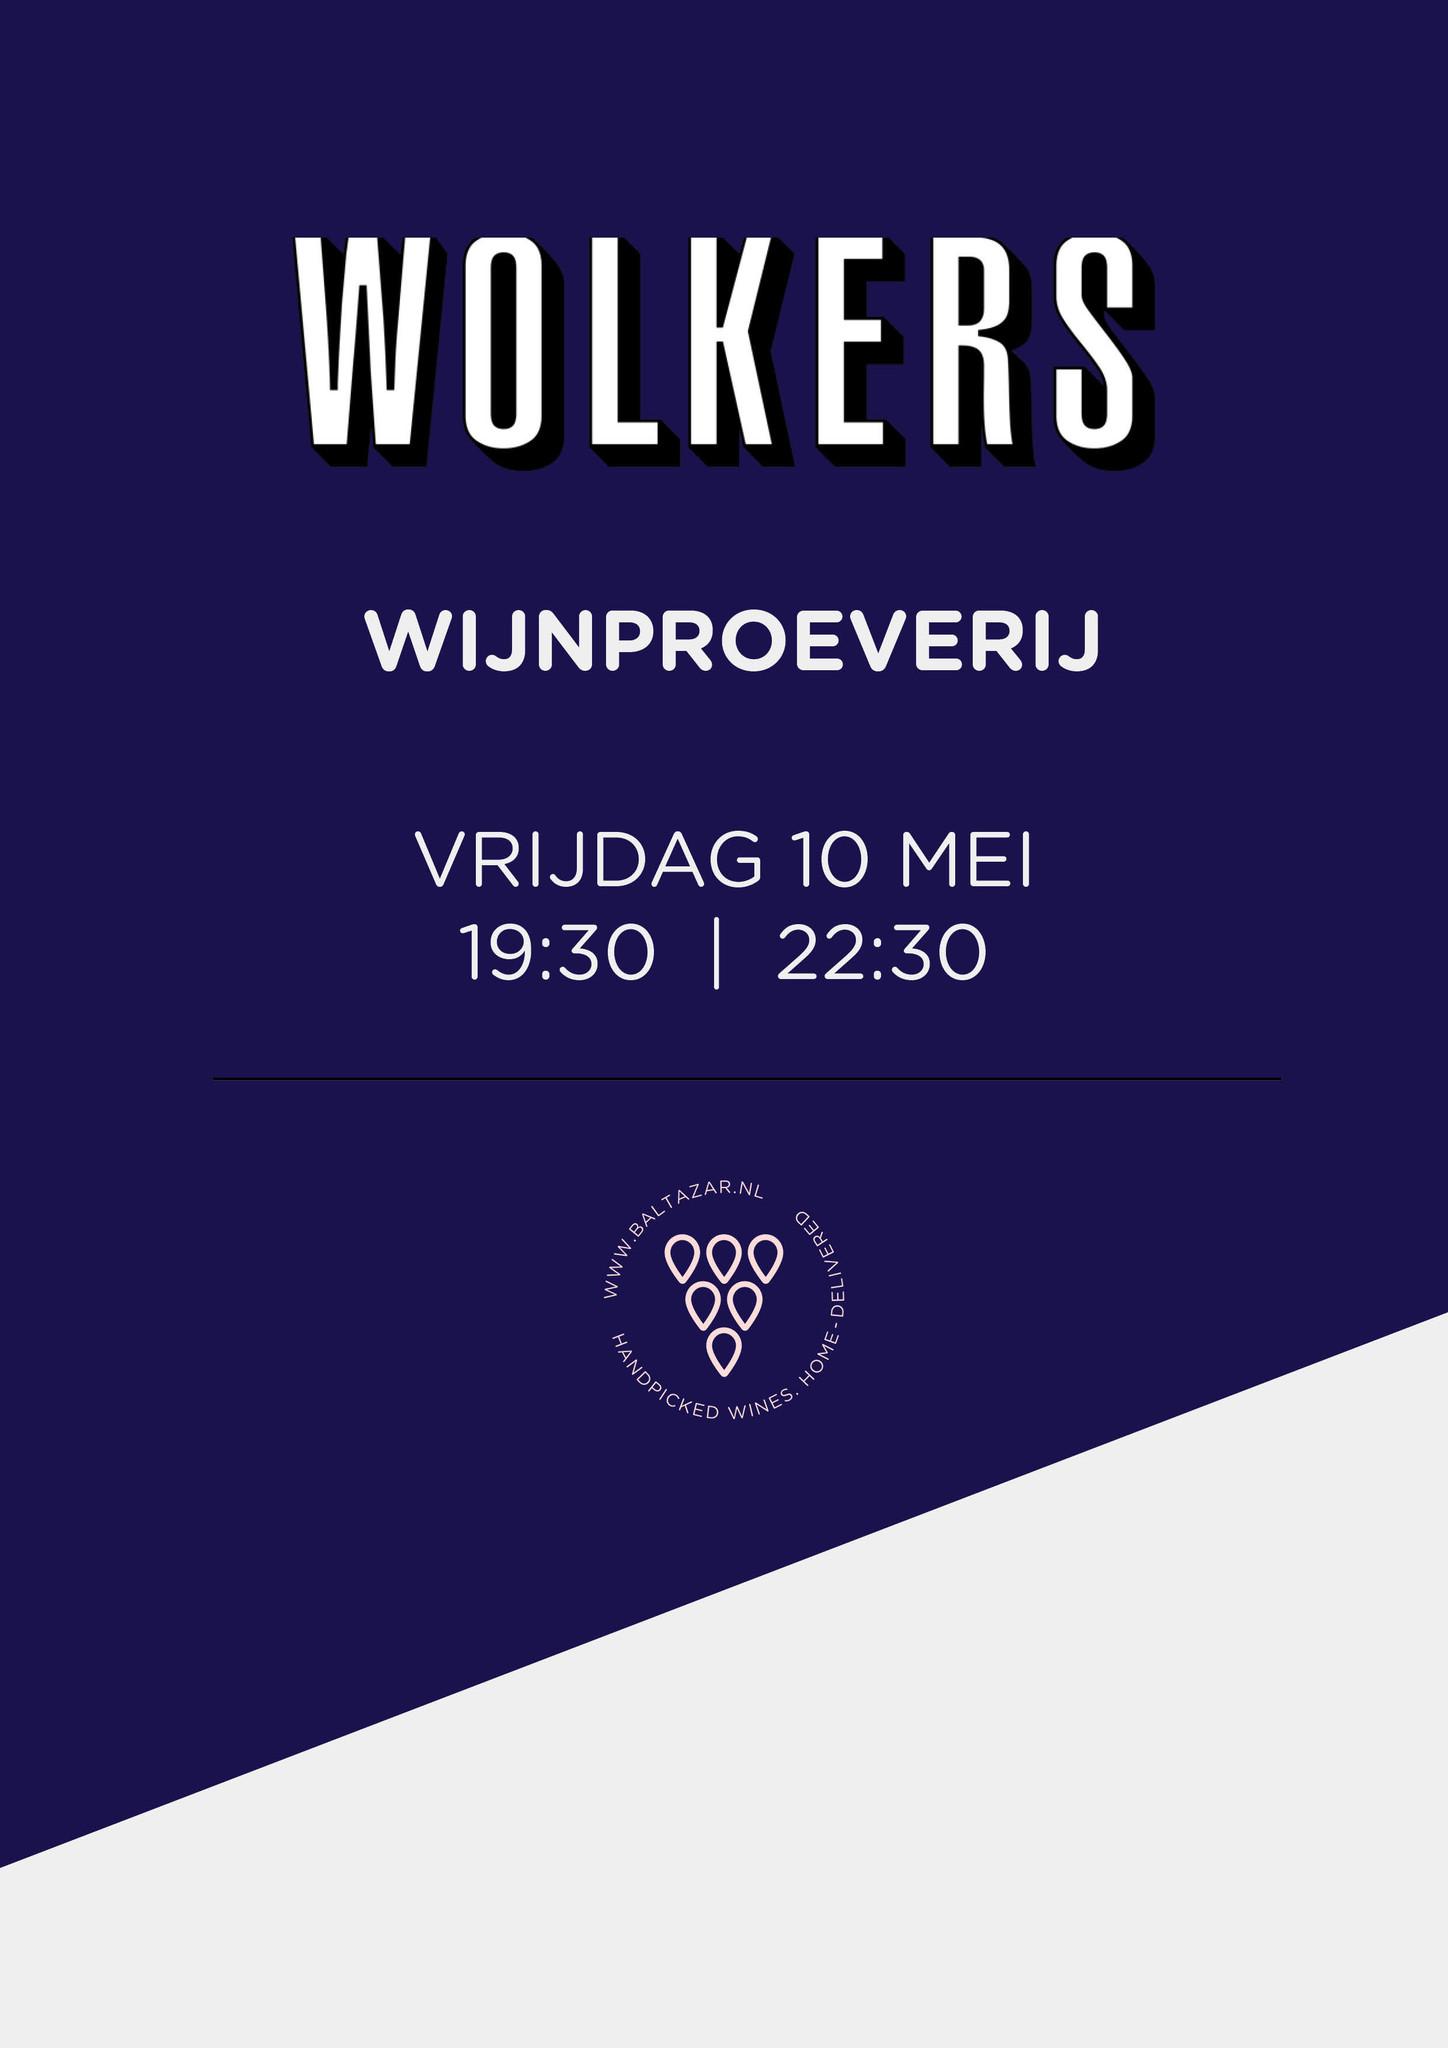 Wijnproeverij 10 mei Wolkers Haarlem